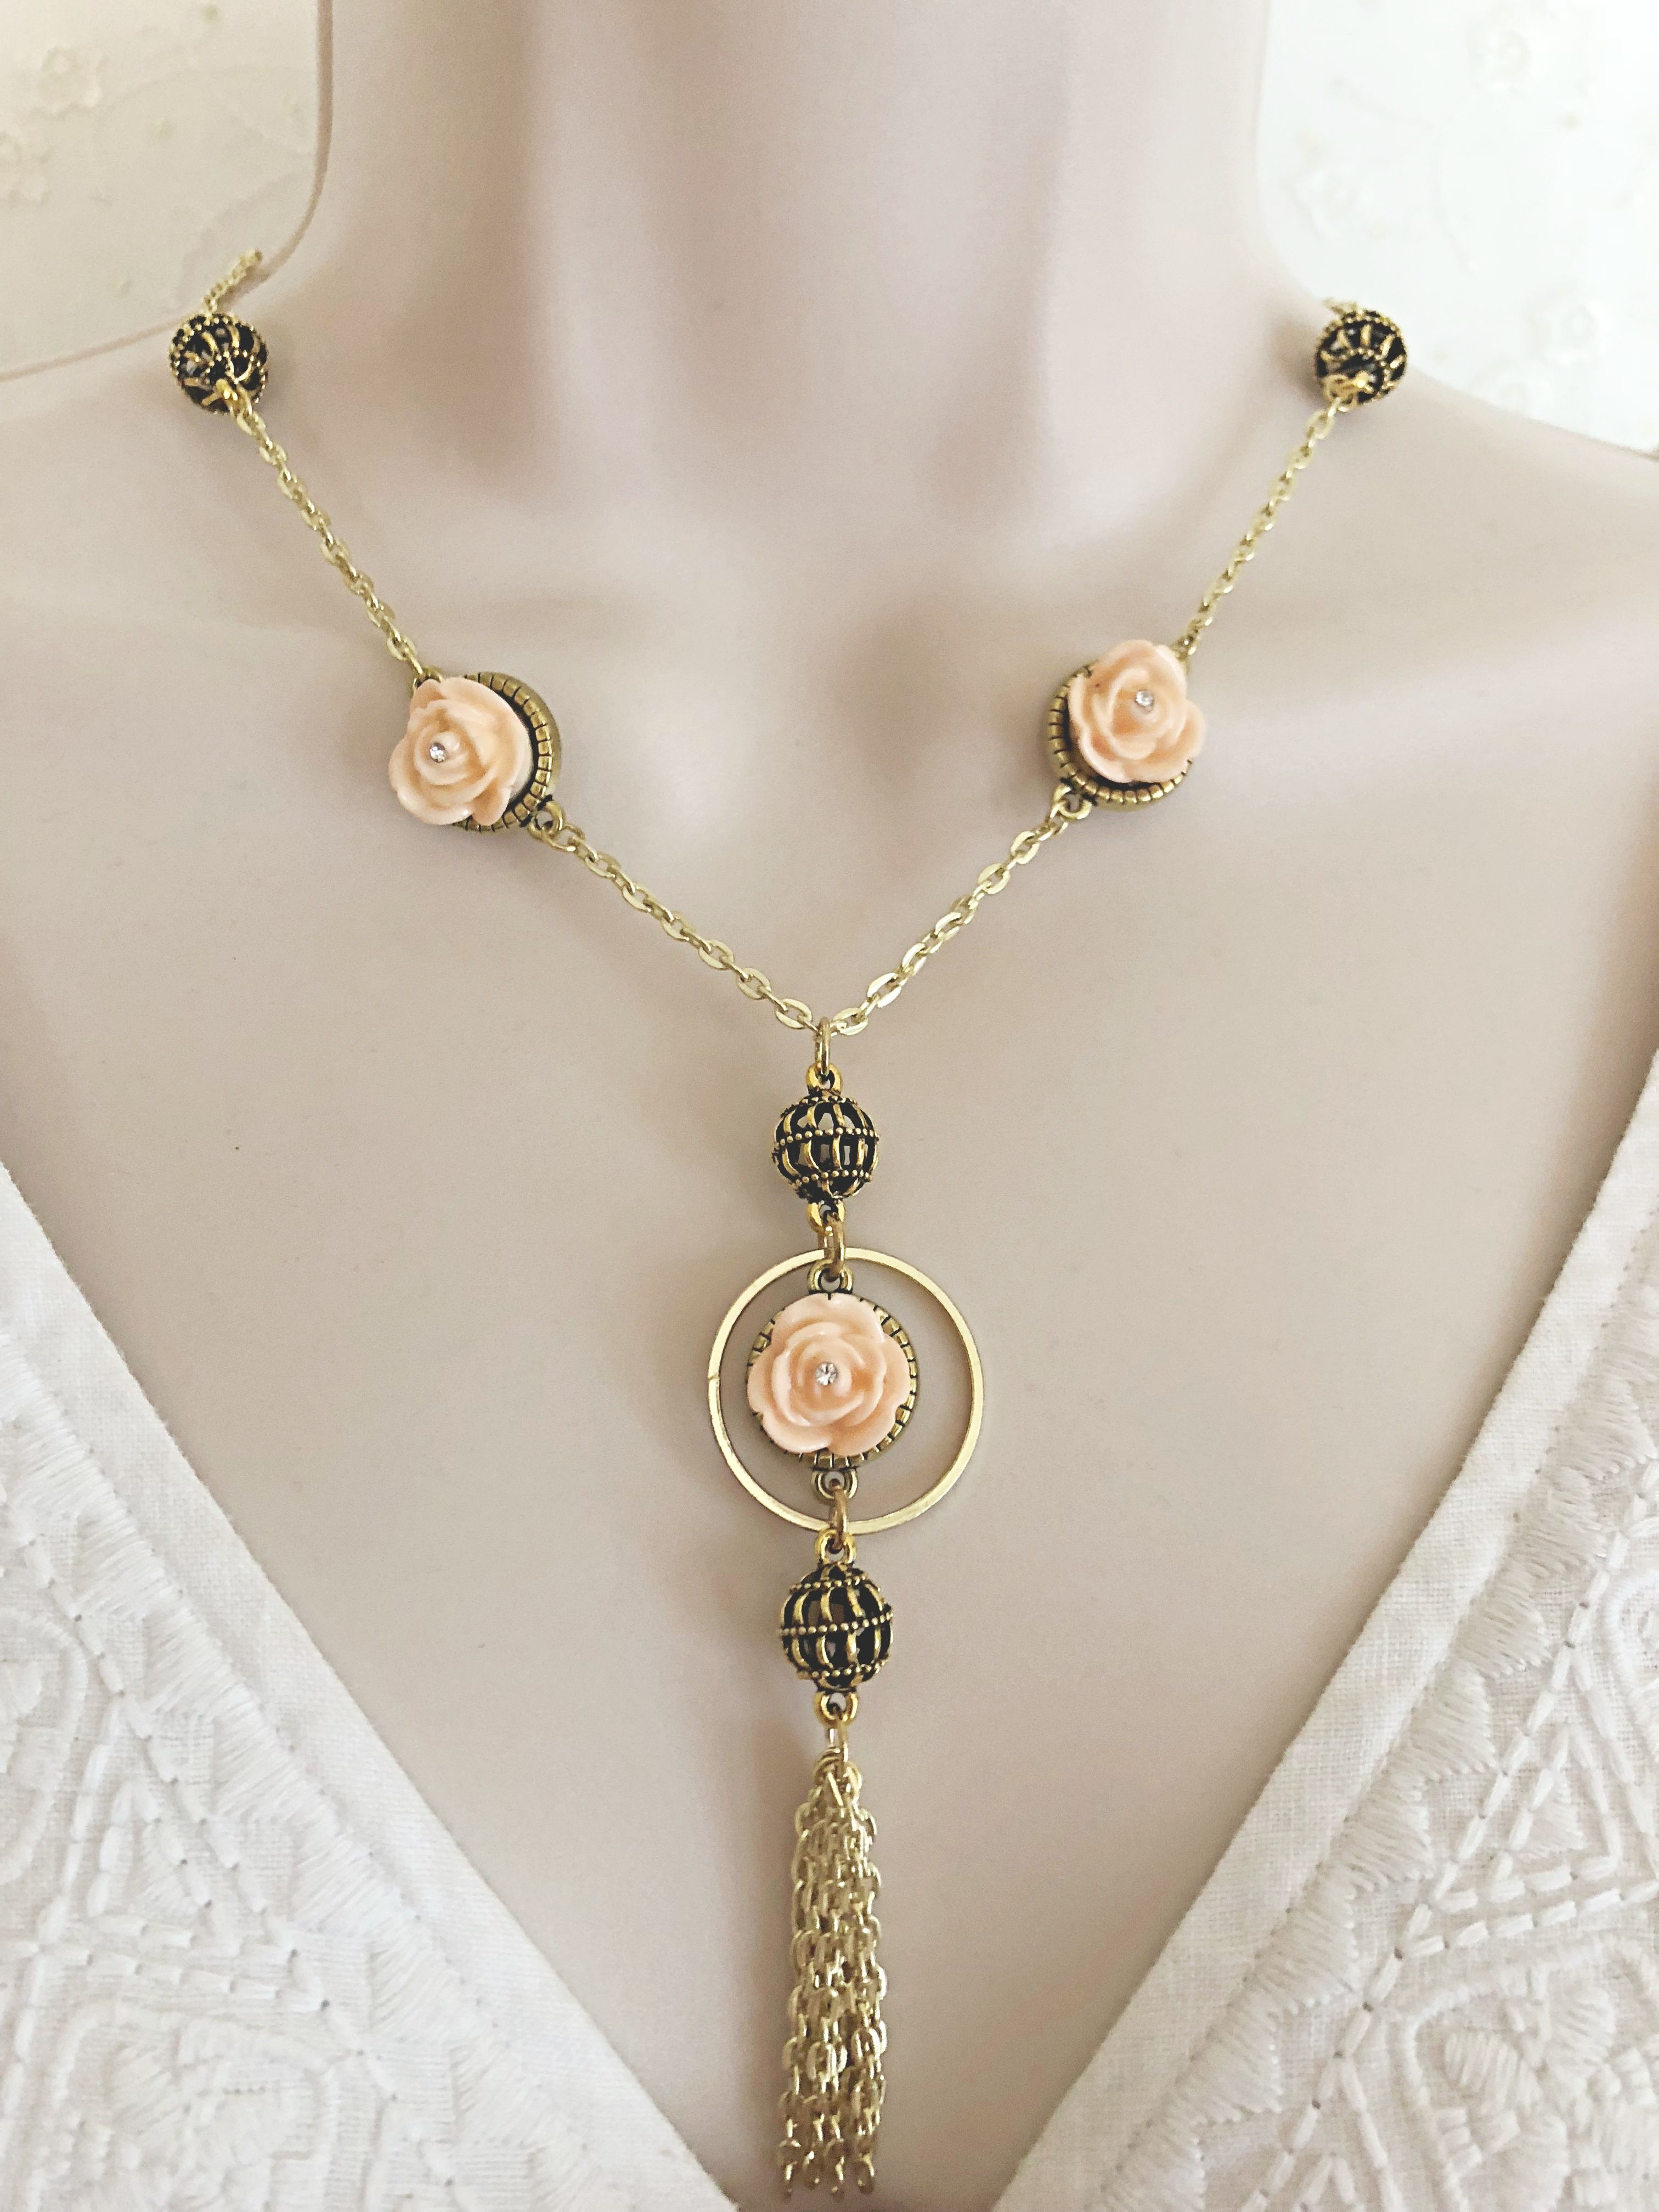 Flower tassel necklace and earring set brass necklace set brass